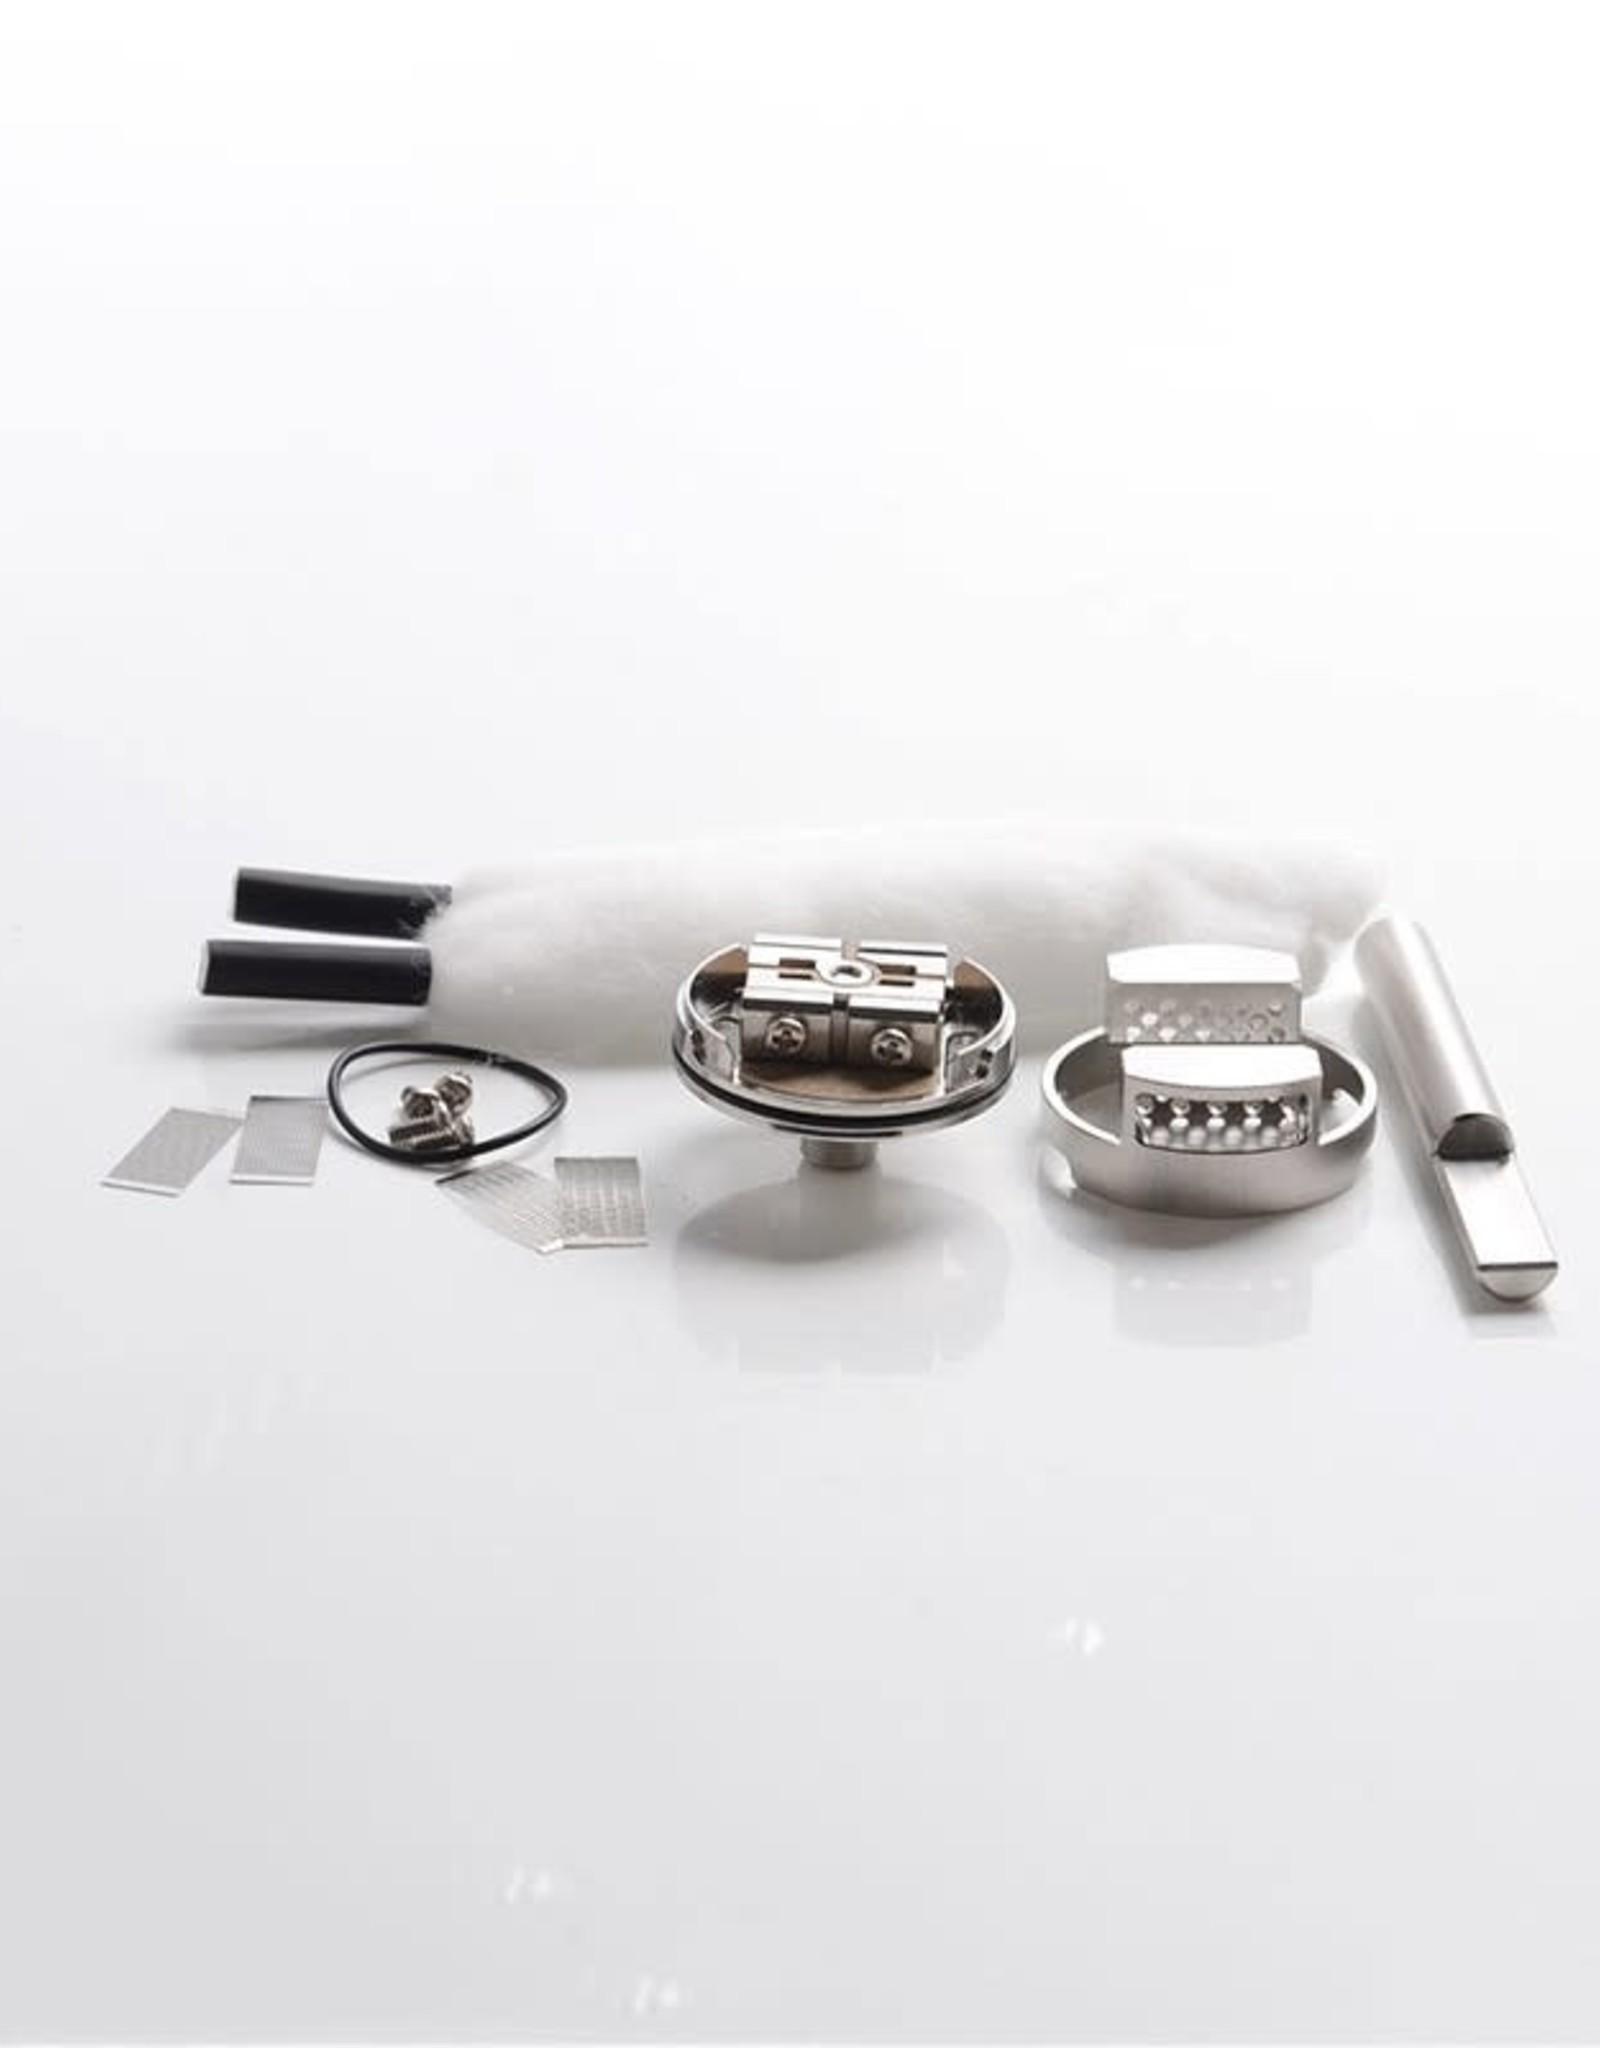 Steam Crave Steam Crave Aromamizer Titan RDTA Dual Series Mesh Deck